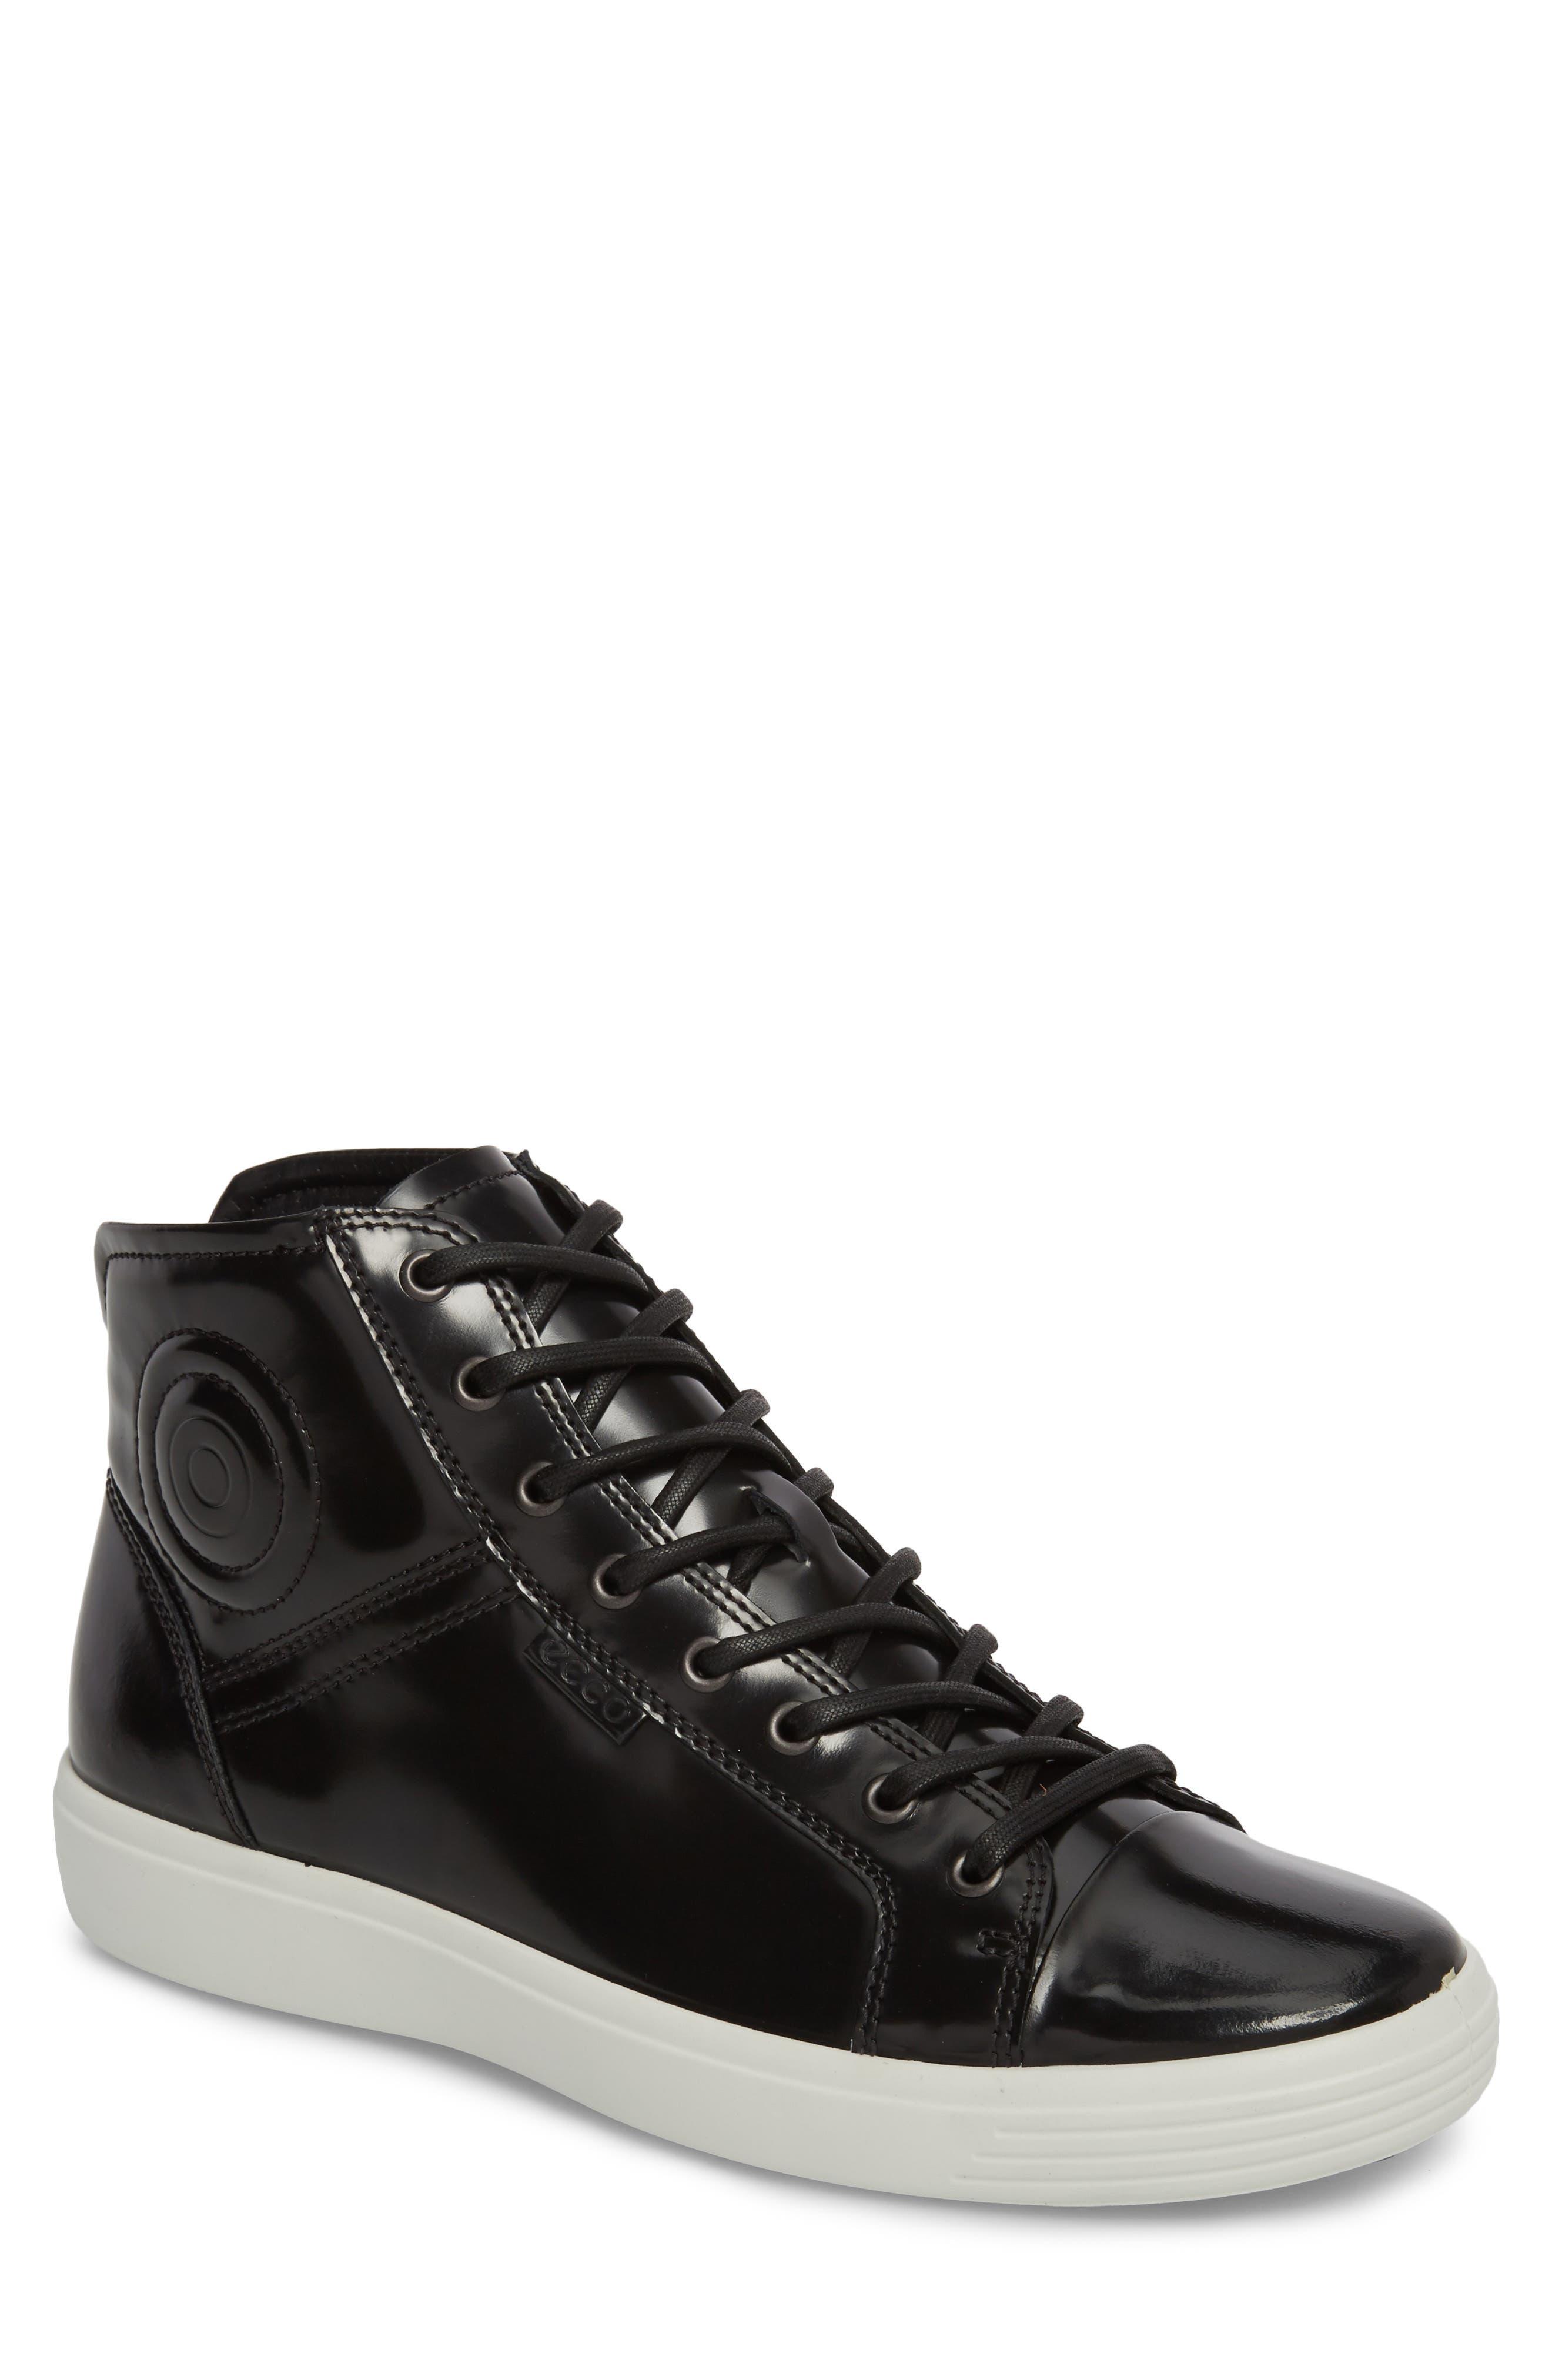 Soft 7 Premium High Top Sneaker,                         Main,                         color, Black Leather